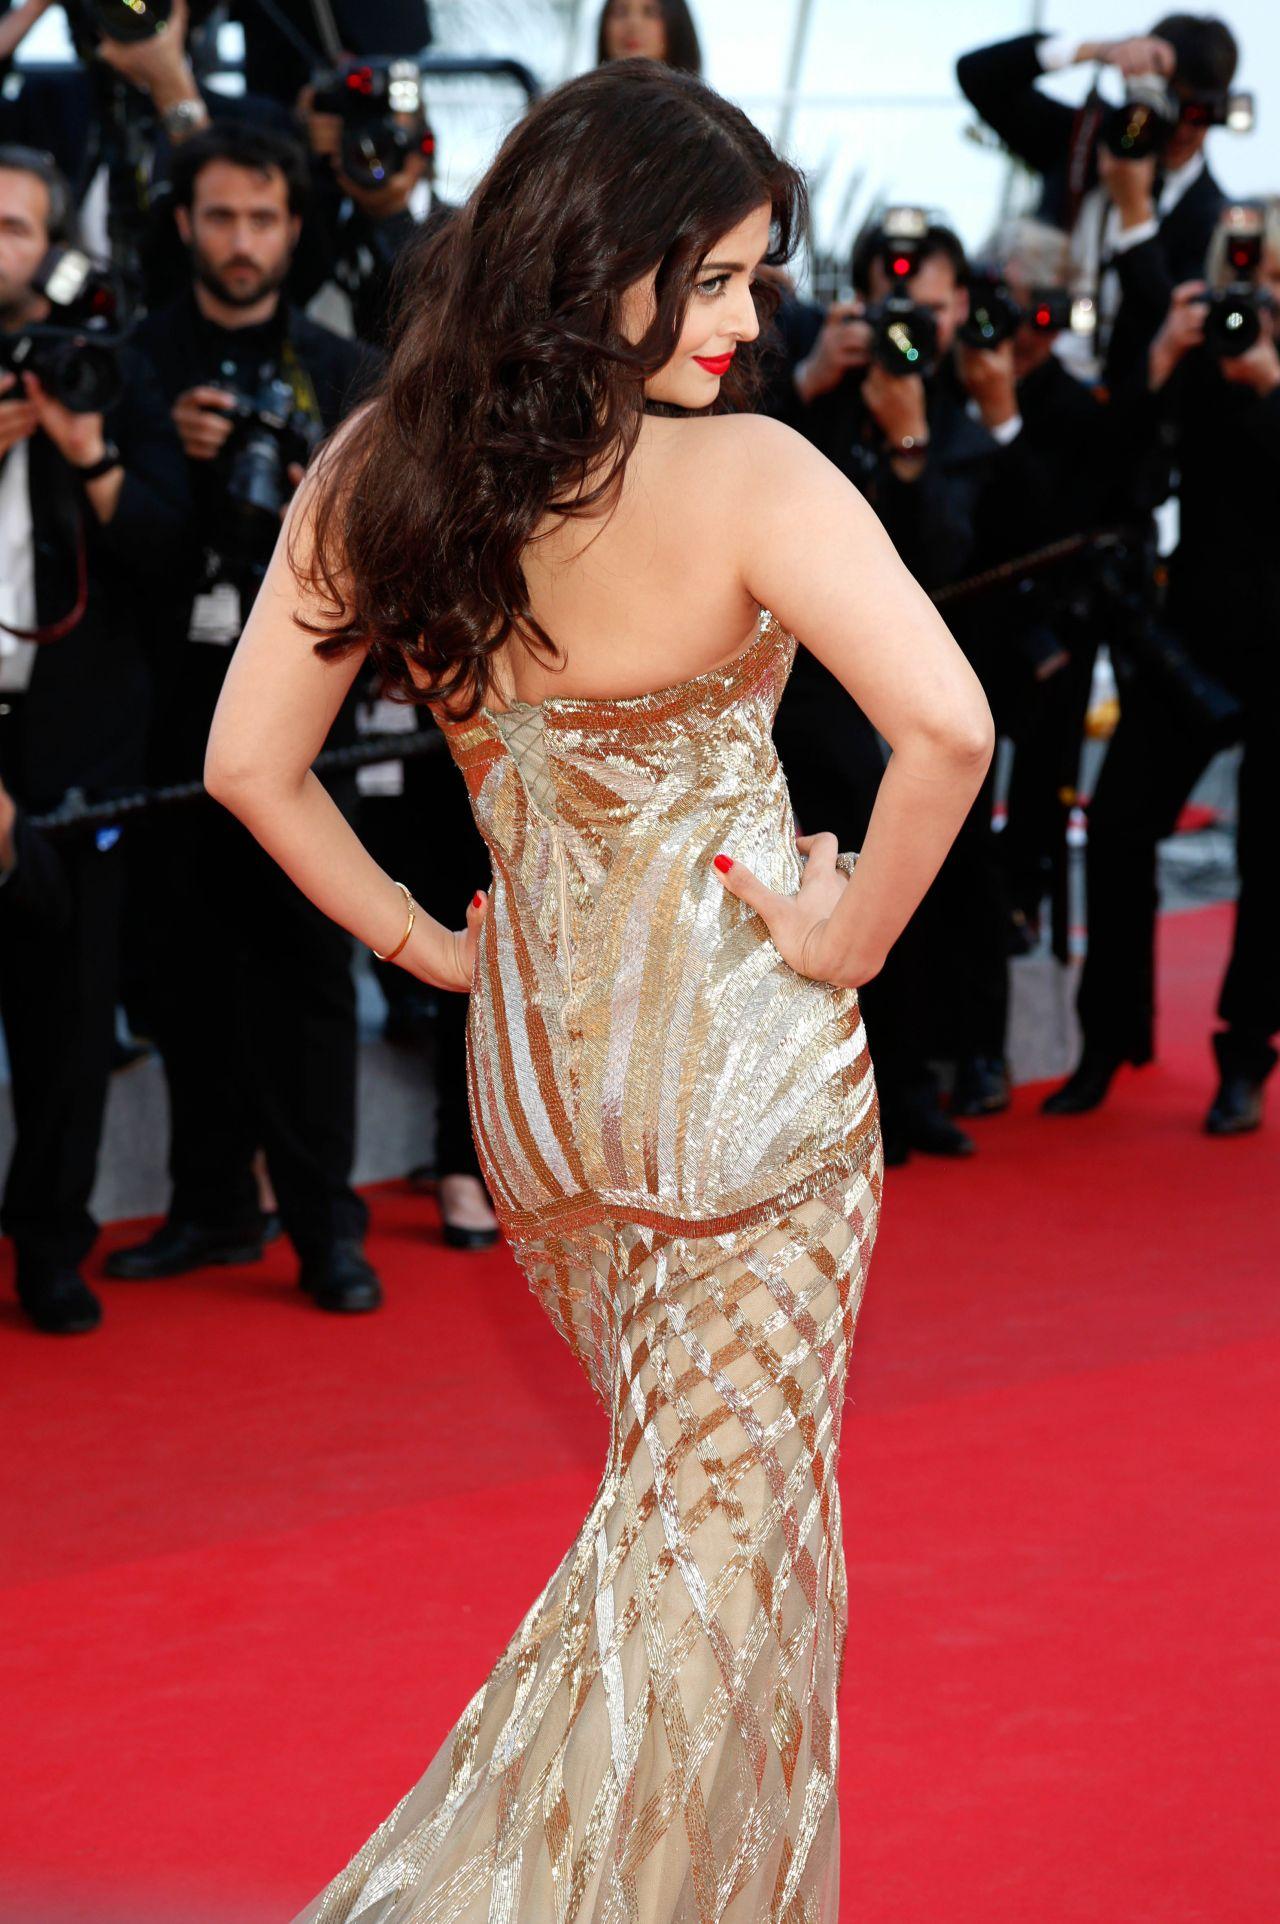 Cannes 2014: Aishwarya Rai Bachchan at the premiere of ... |Aishwarya Rai 2014 March